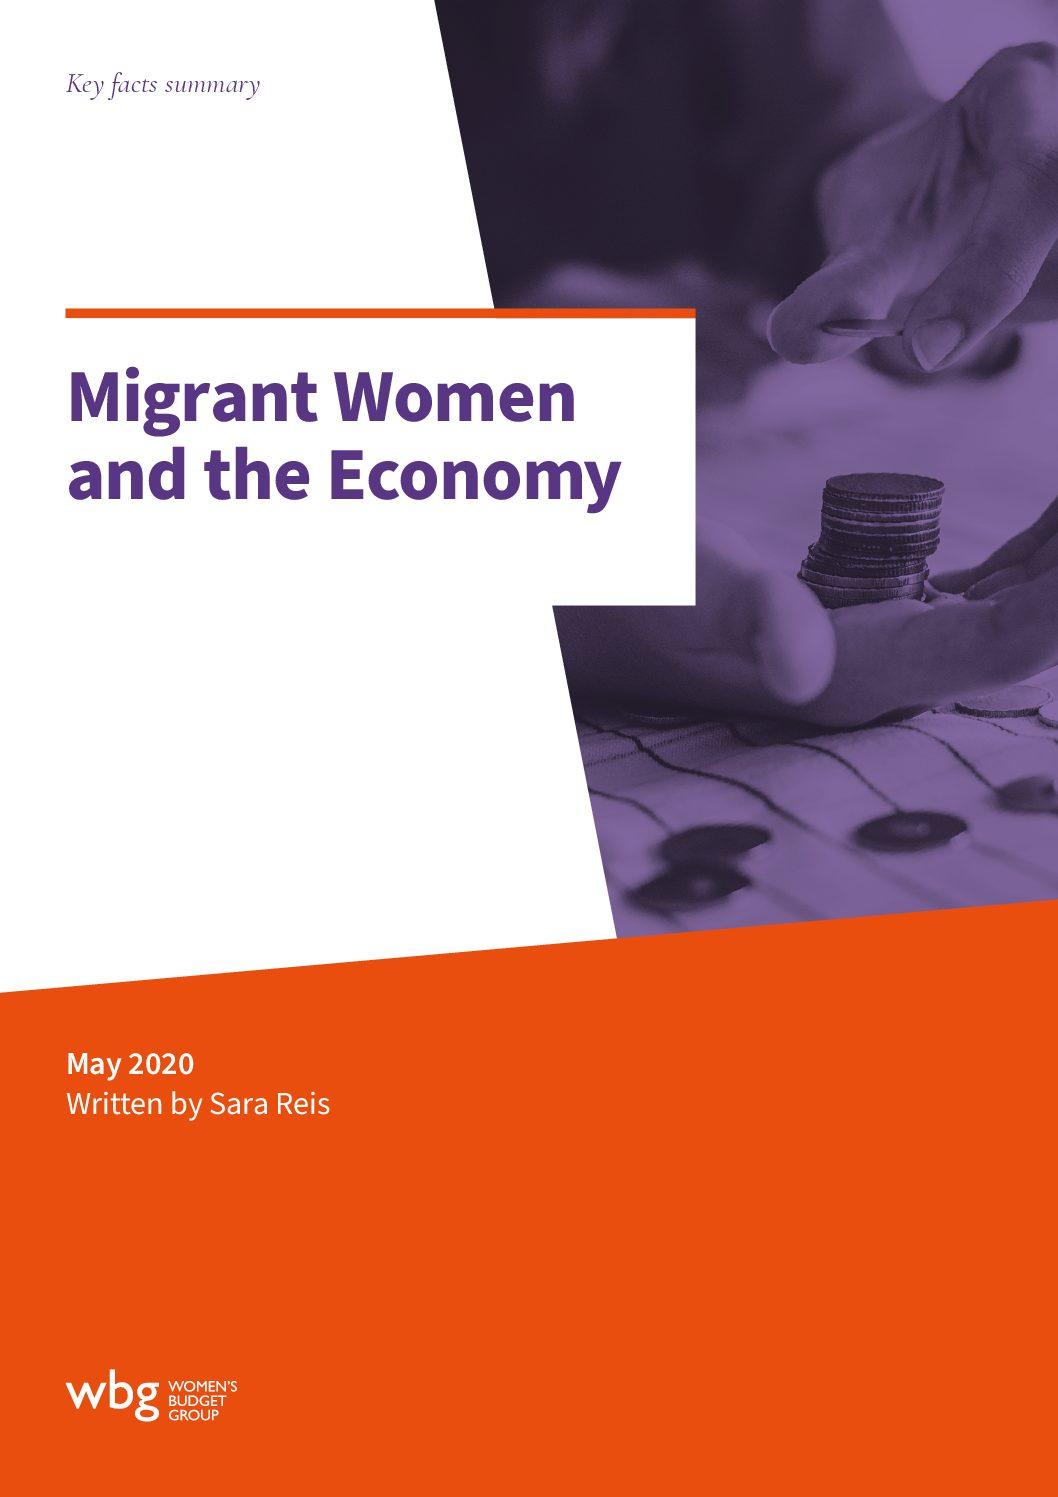 Latest Report: Migrant Women and the Economy